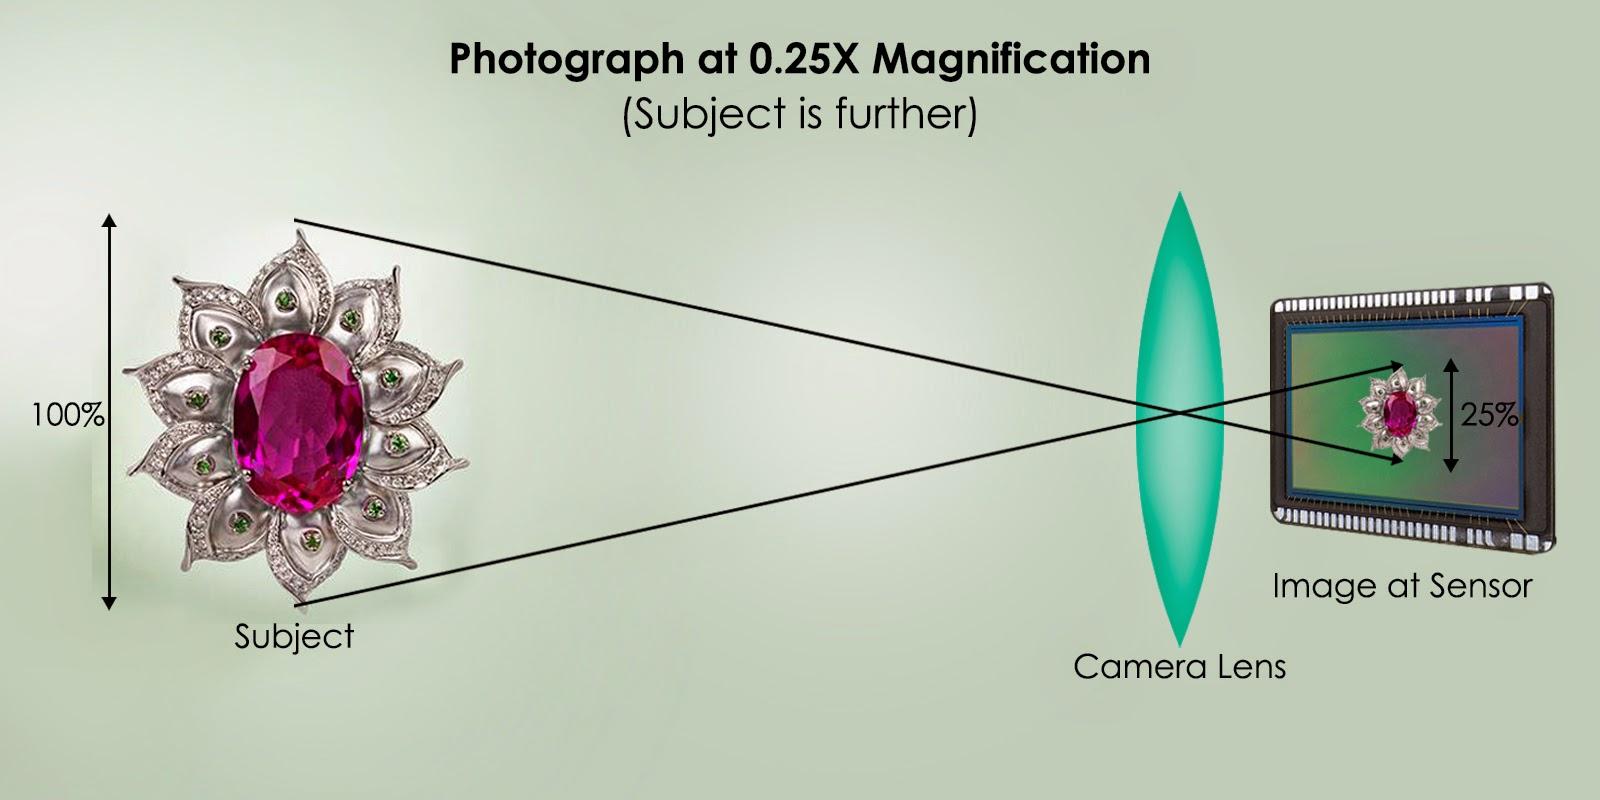 Photograph at .25x magnification